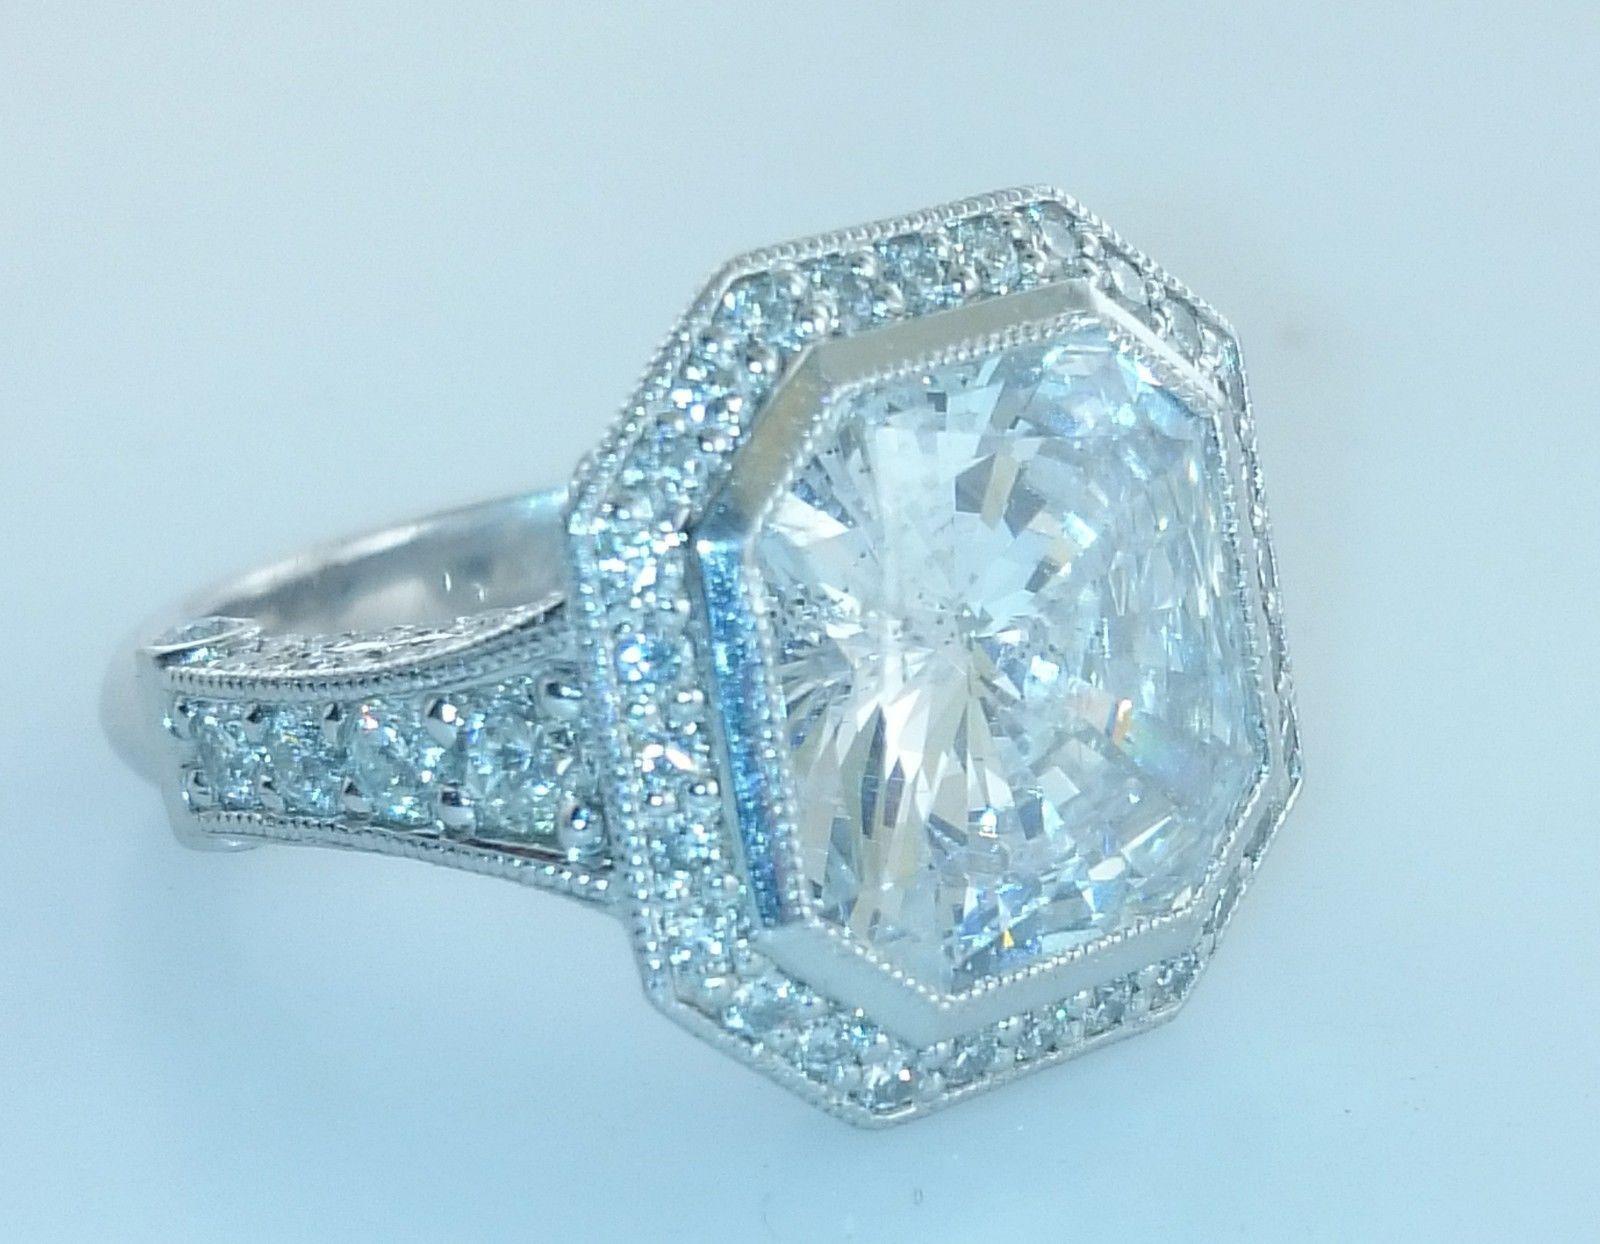 Contemporary Radiant 11 Carat Diamond Ring Set In Platinum 180k Value Radiant Diamond Rings Diamond Ring Radiant Diamond